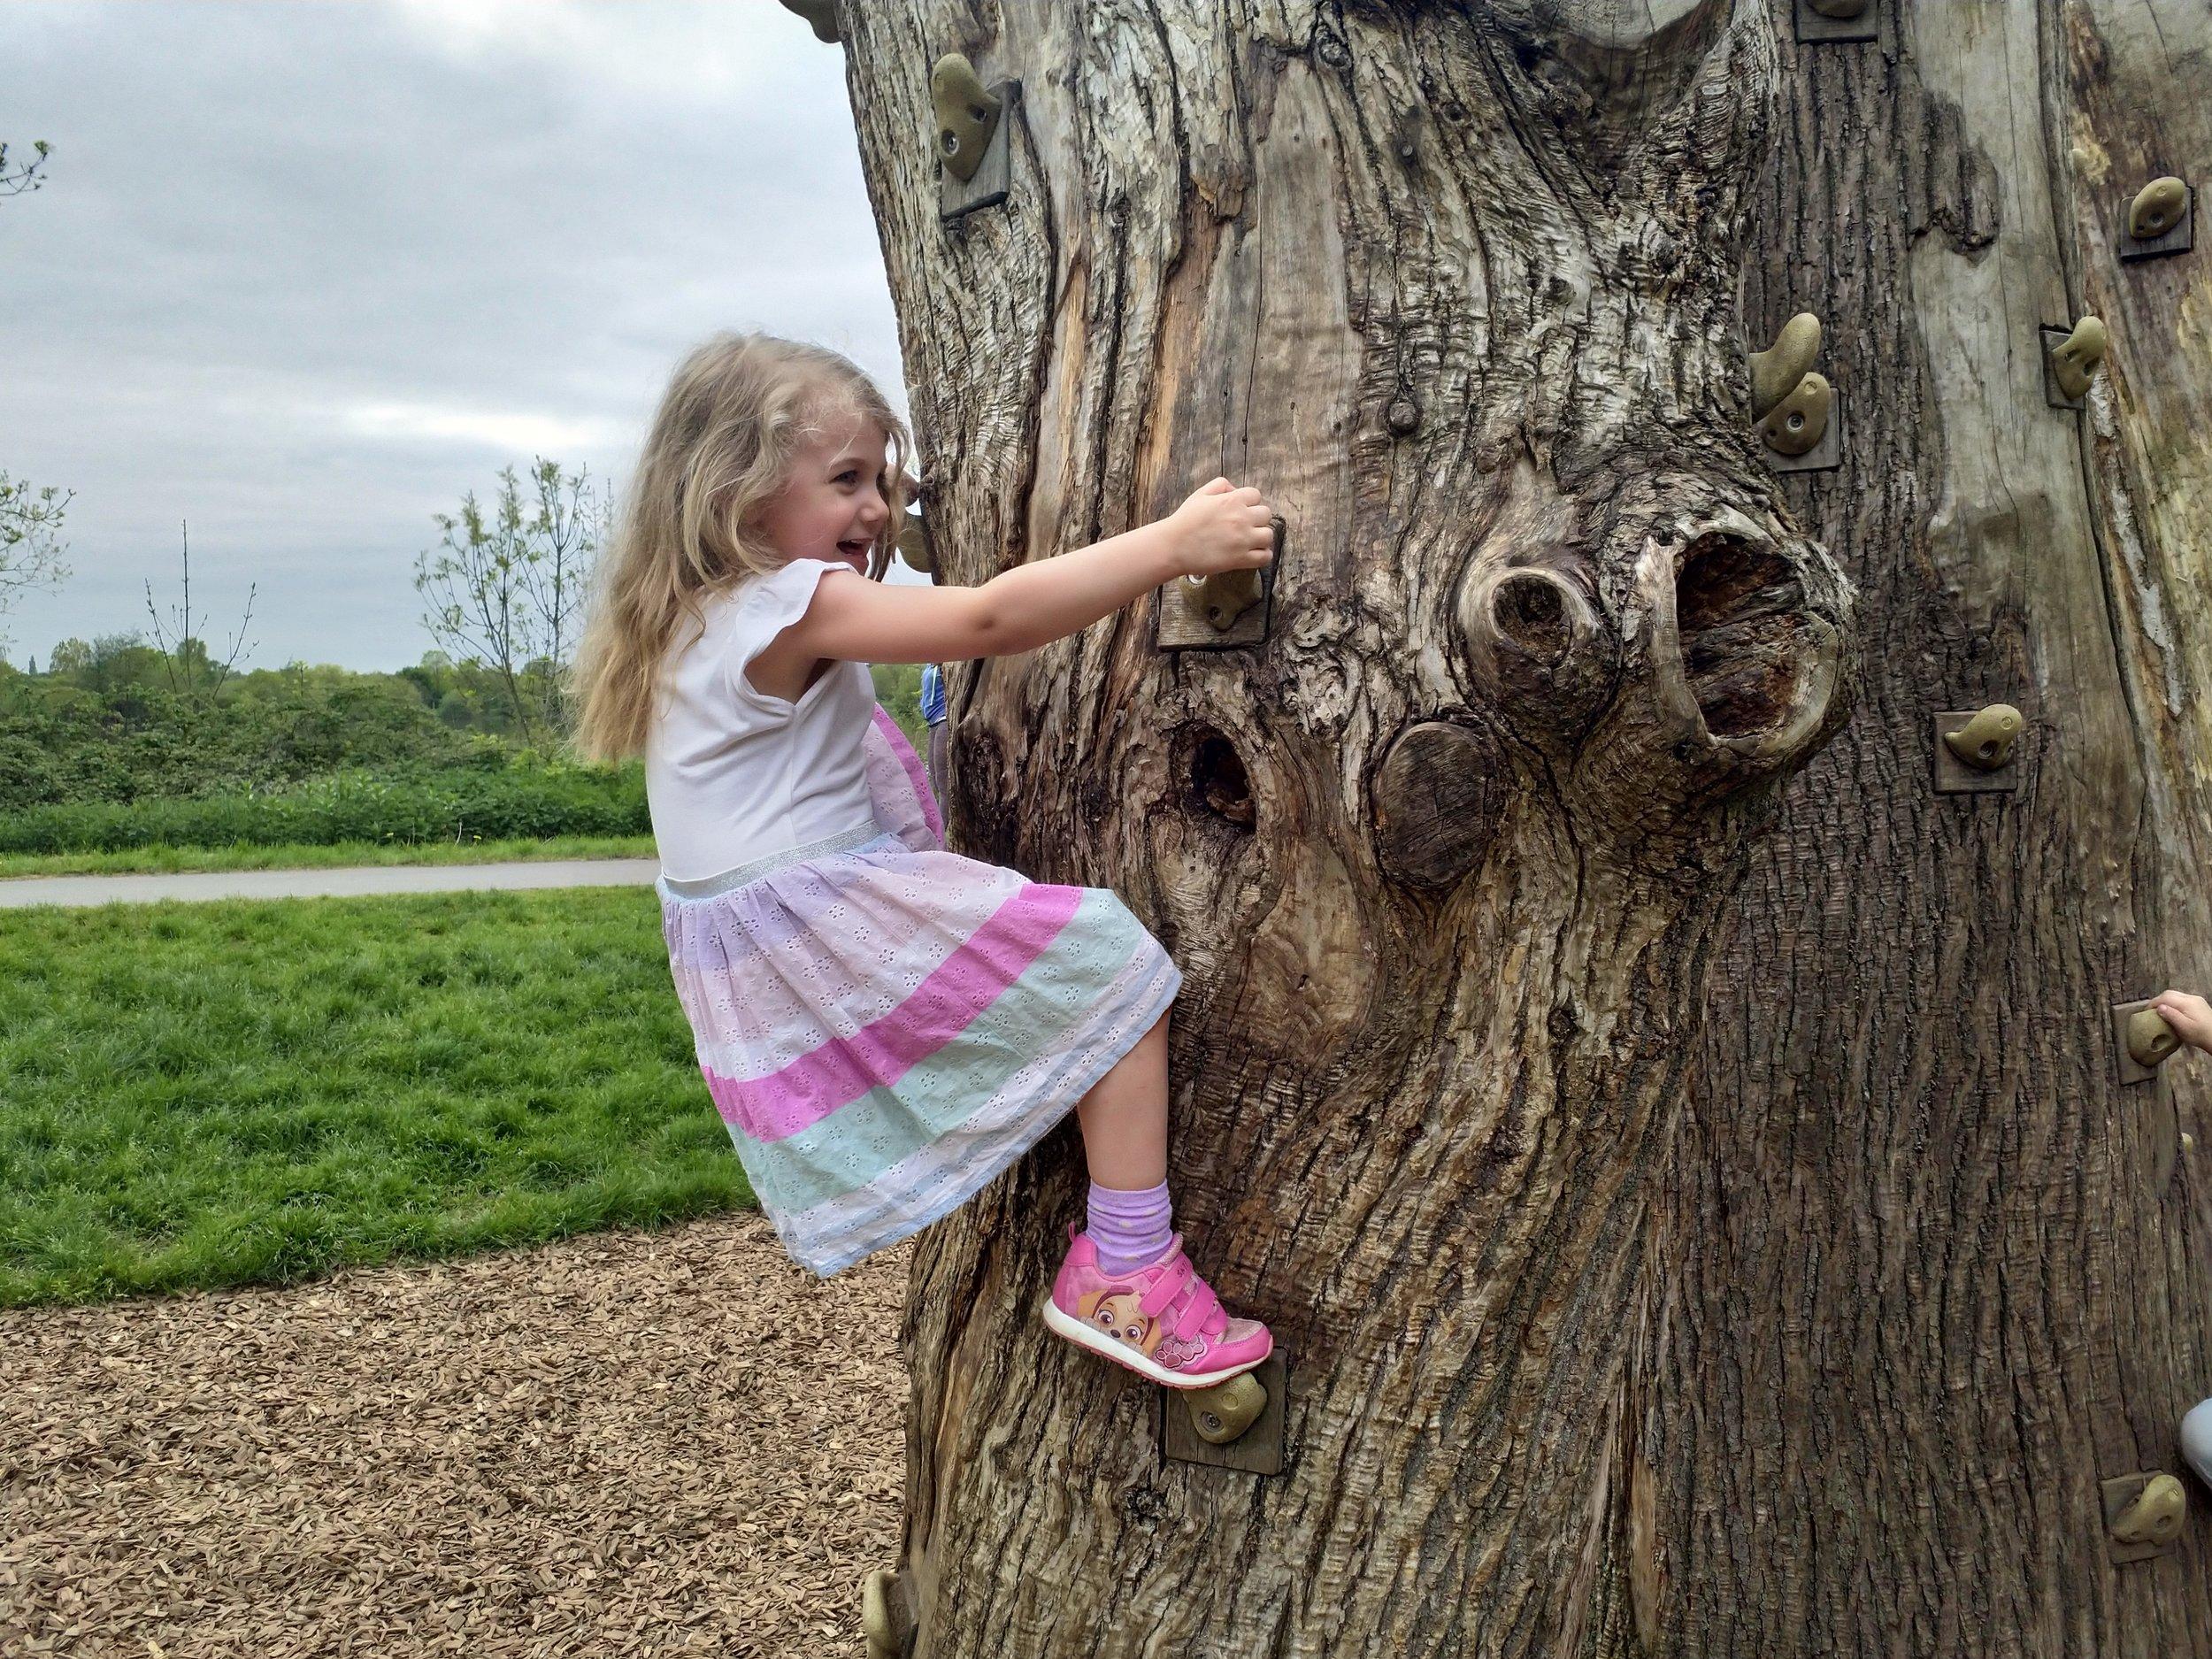 Cloimbing wall tree trunk Ferry Meadows Nene Park Peterborough